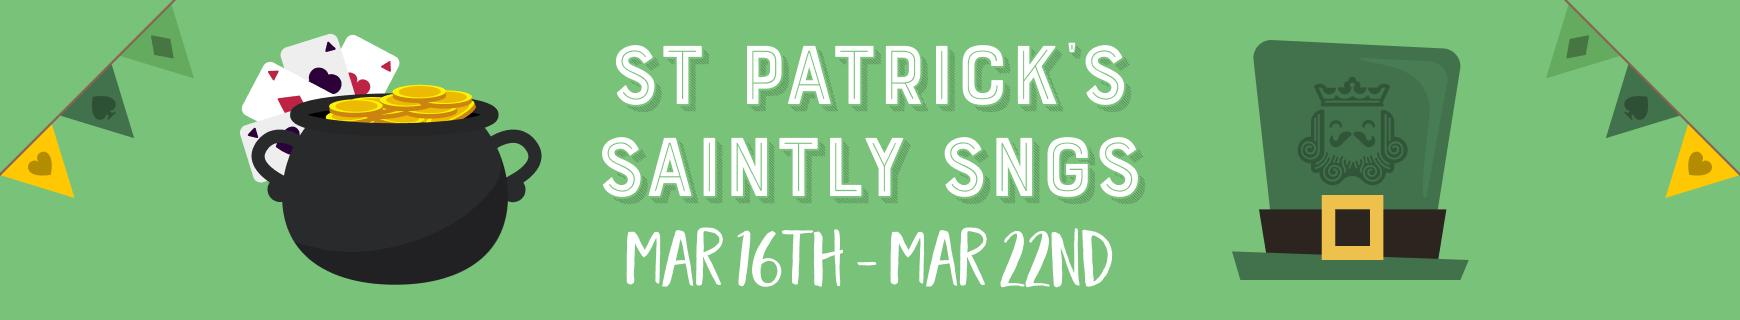 St patrick's saintly sngs 2020   dashboard %28870 x 160%29 2x